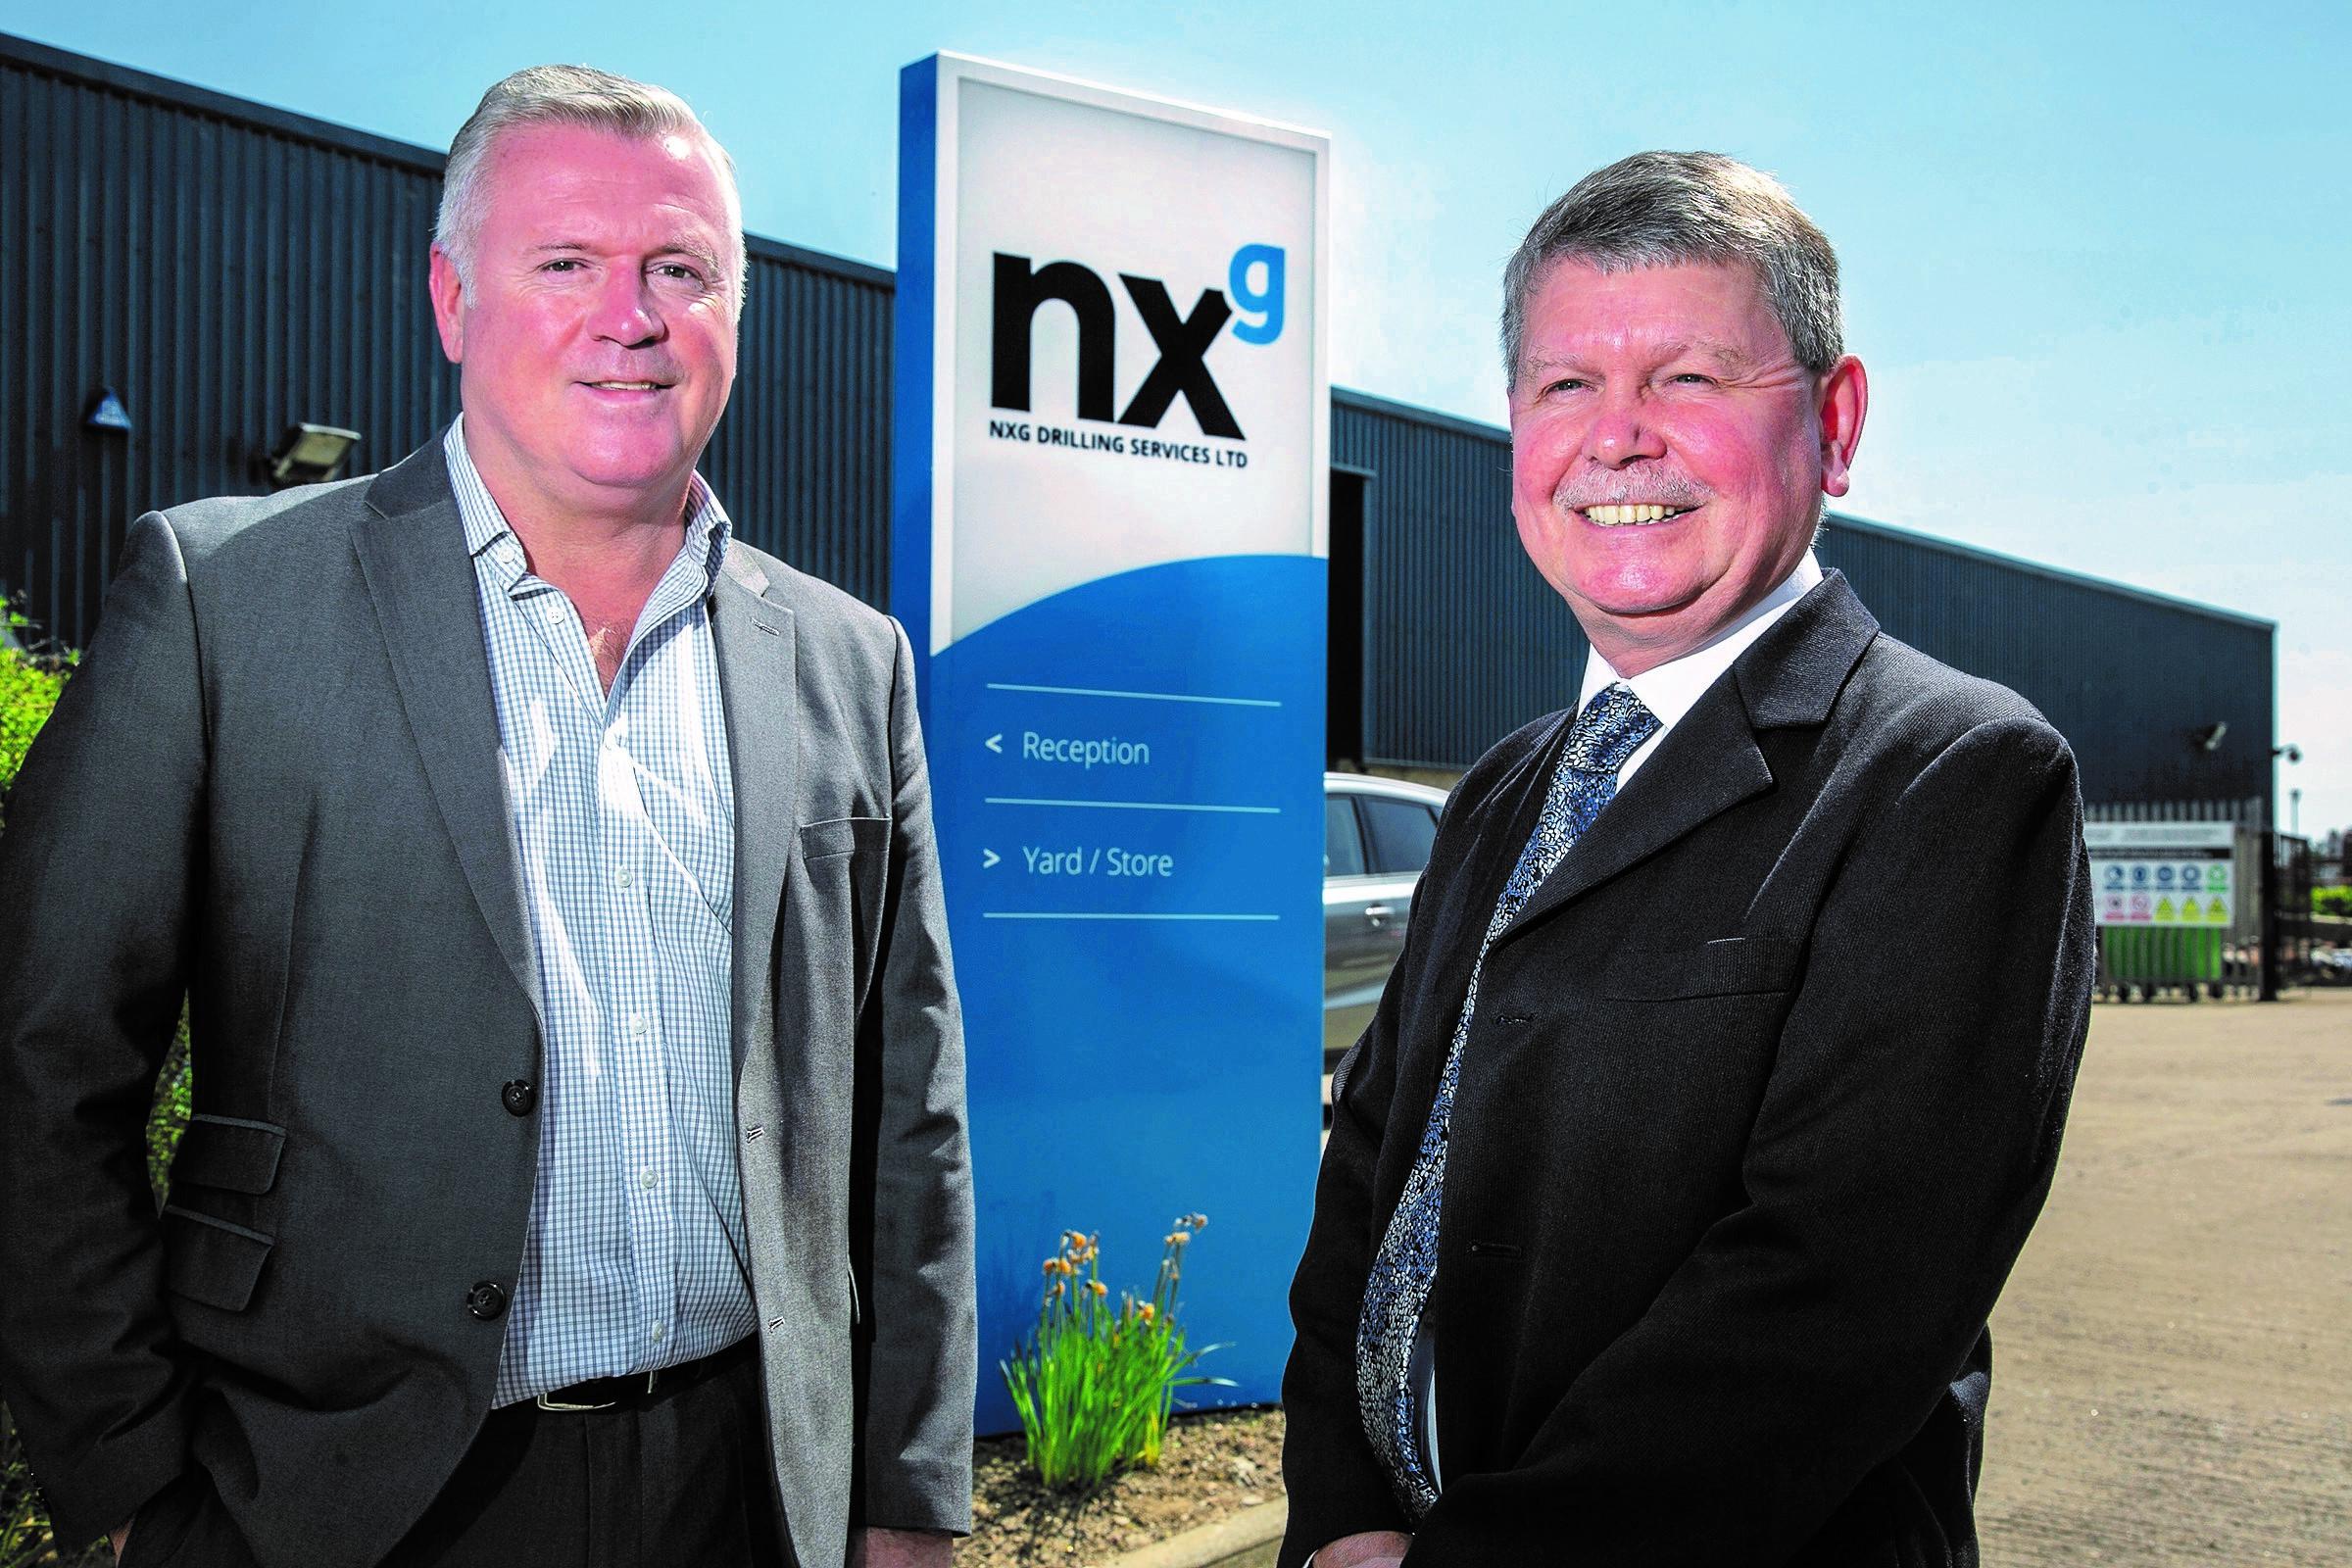 Top team … NXG managing director Rod Coffey, left, with former Weatherford UK managing director Ian McCartney